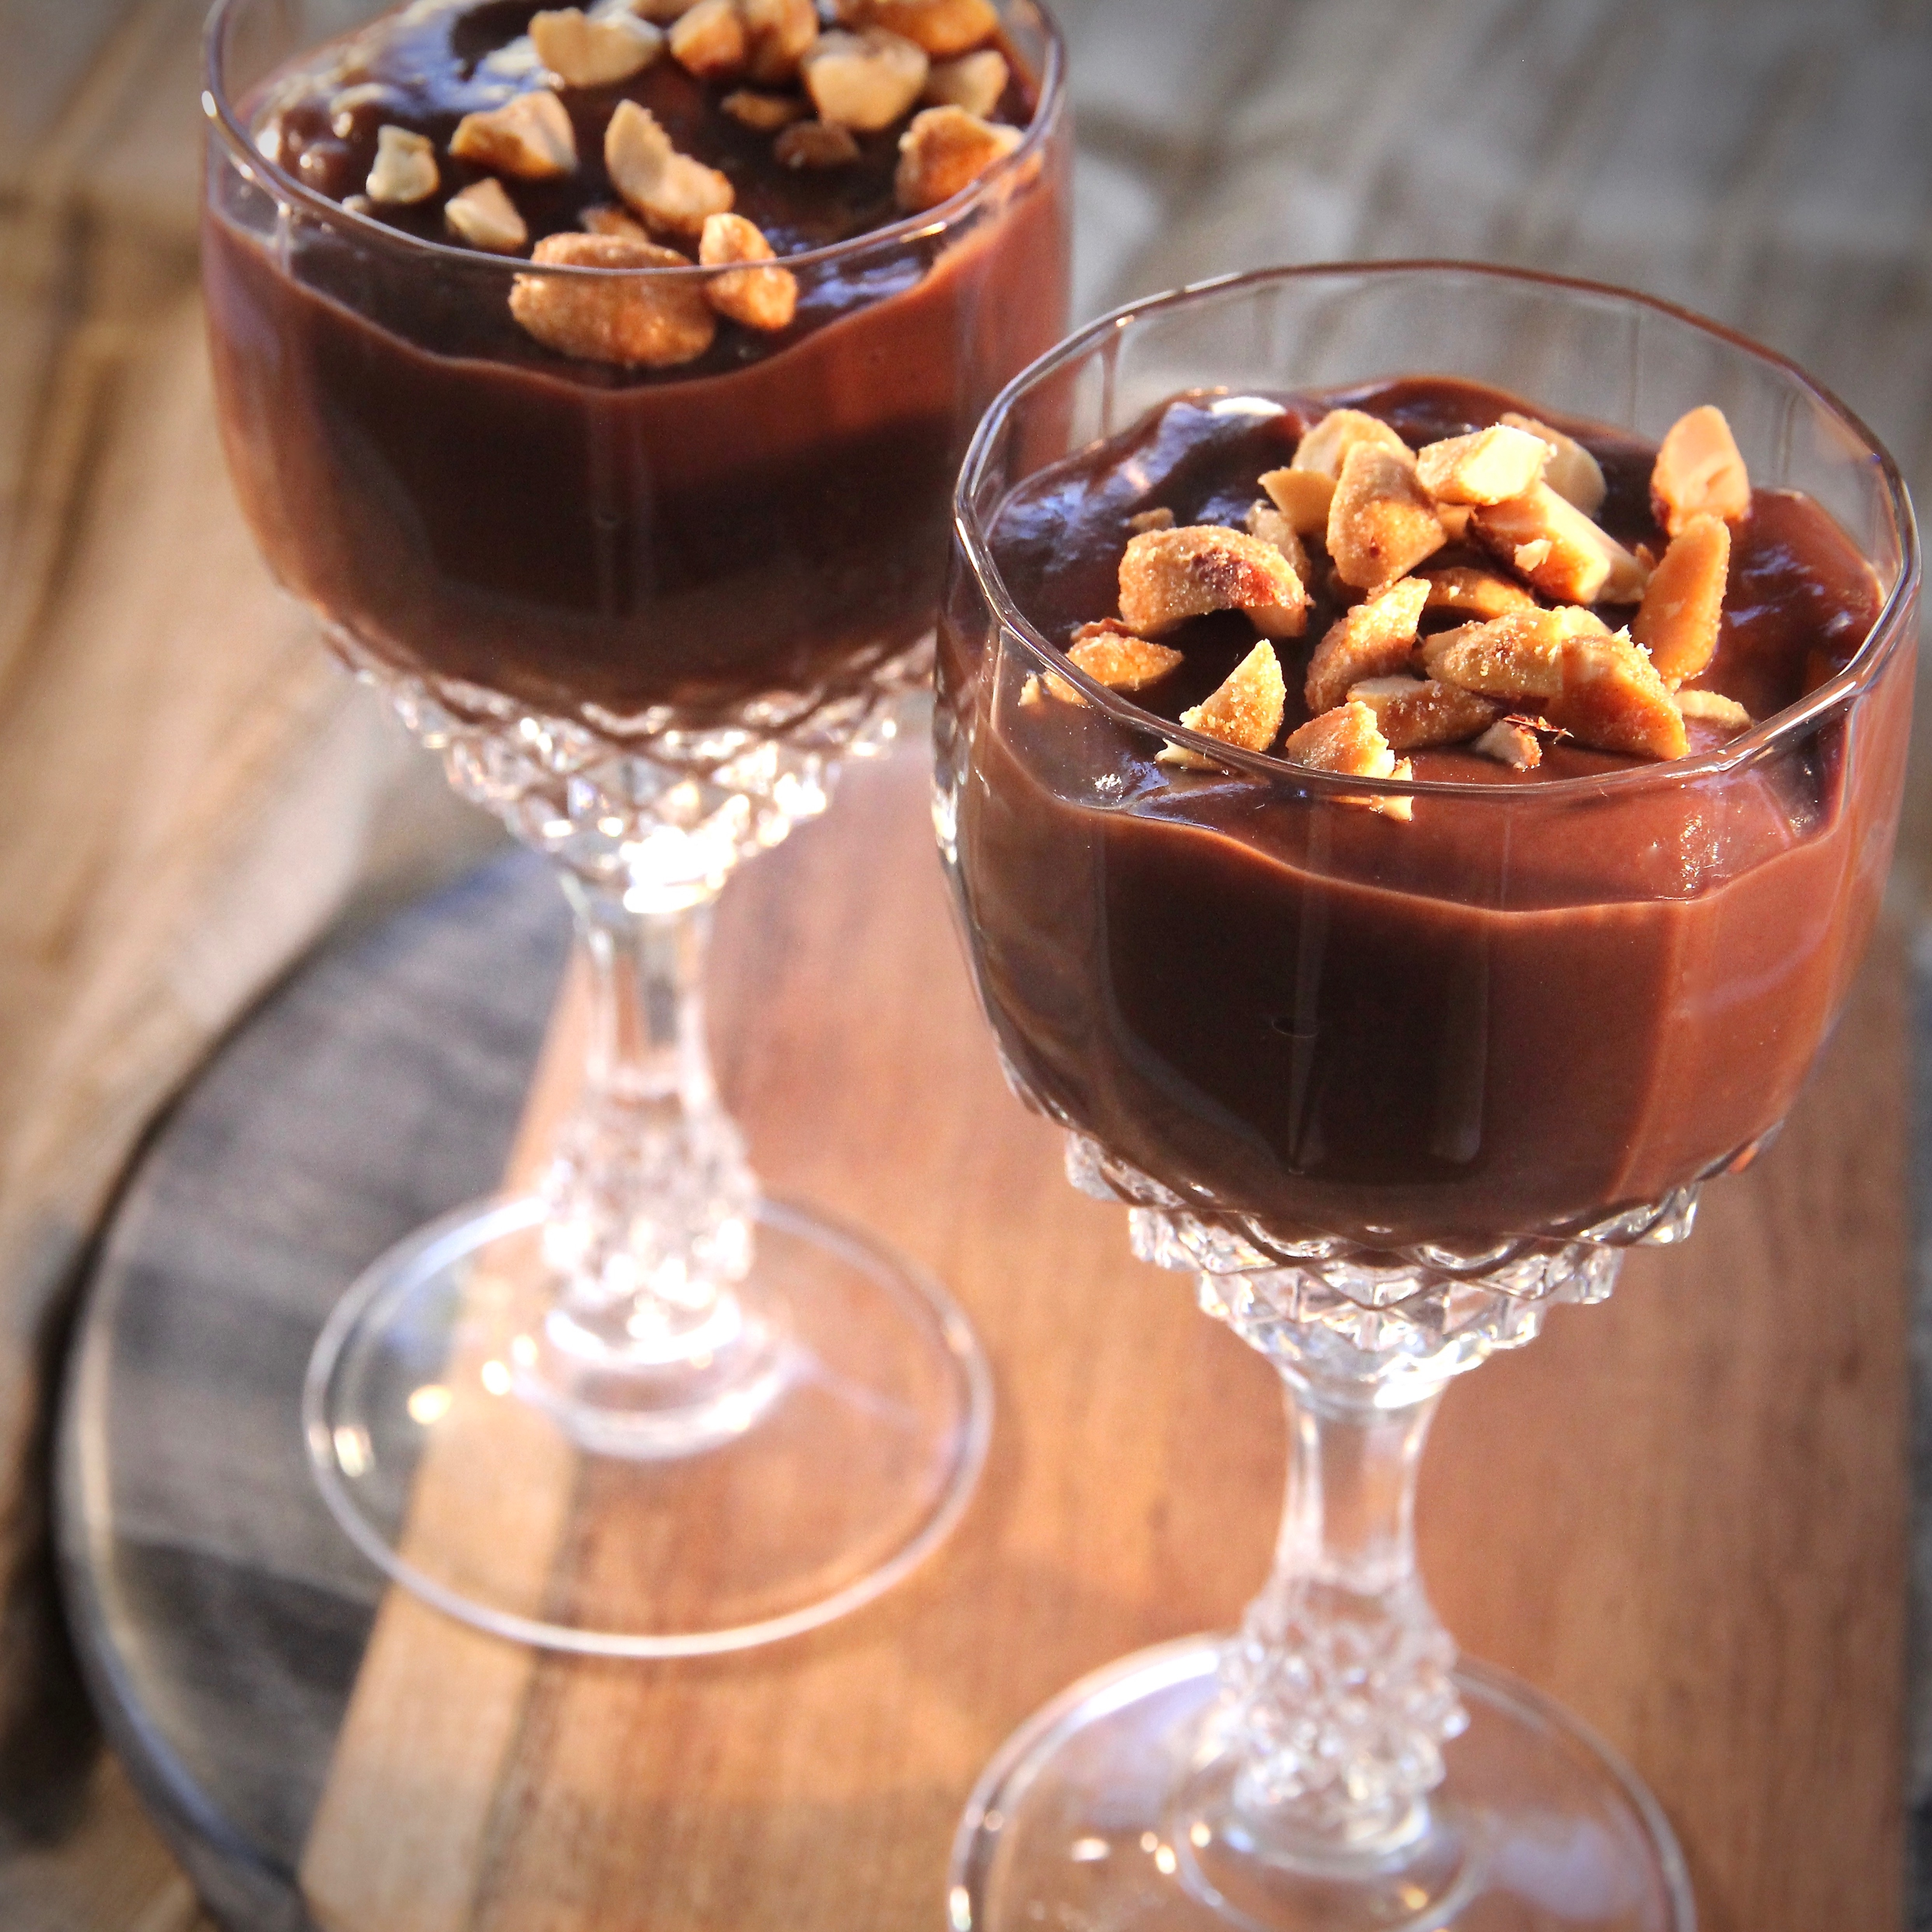 Chocolate Almond Pudding lutzflcat